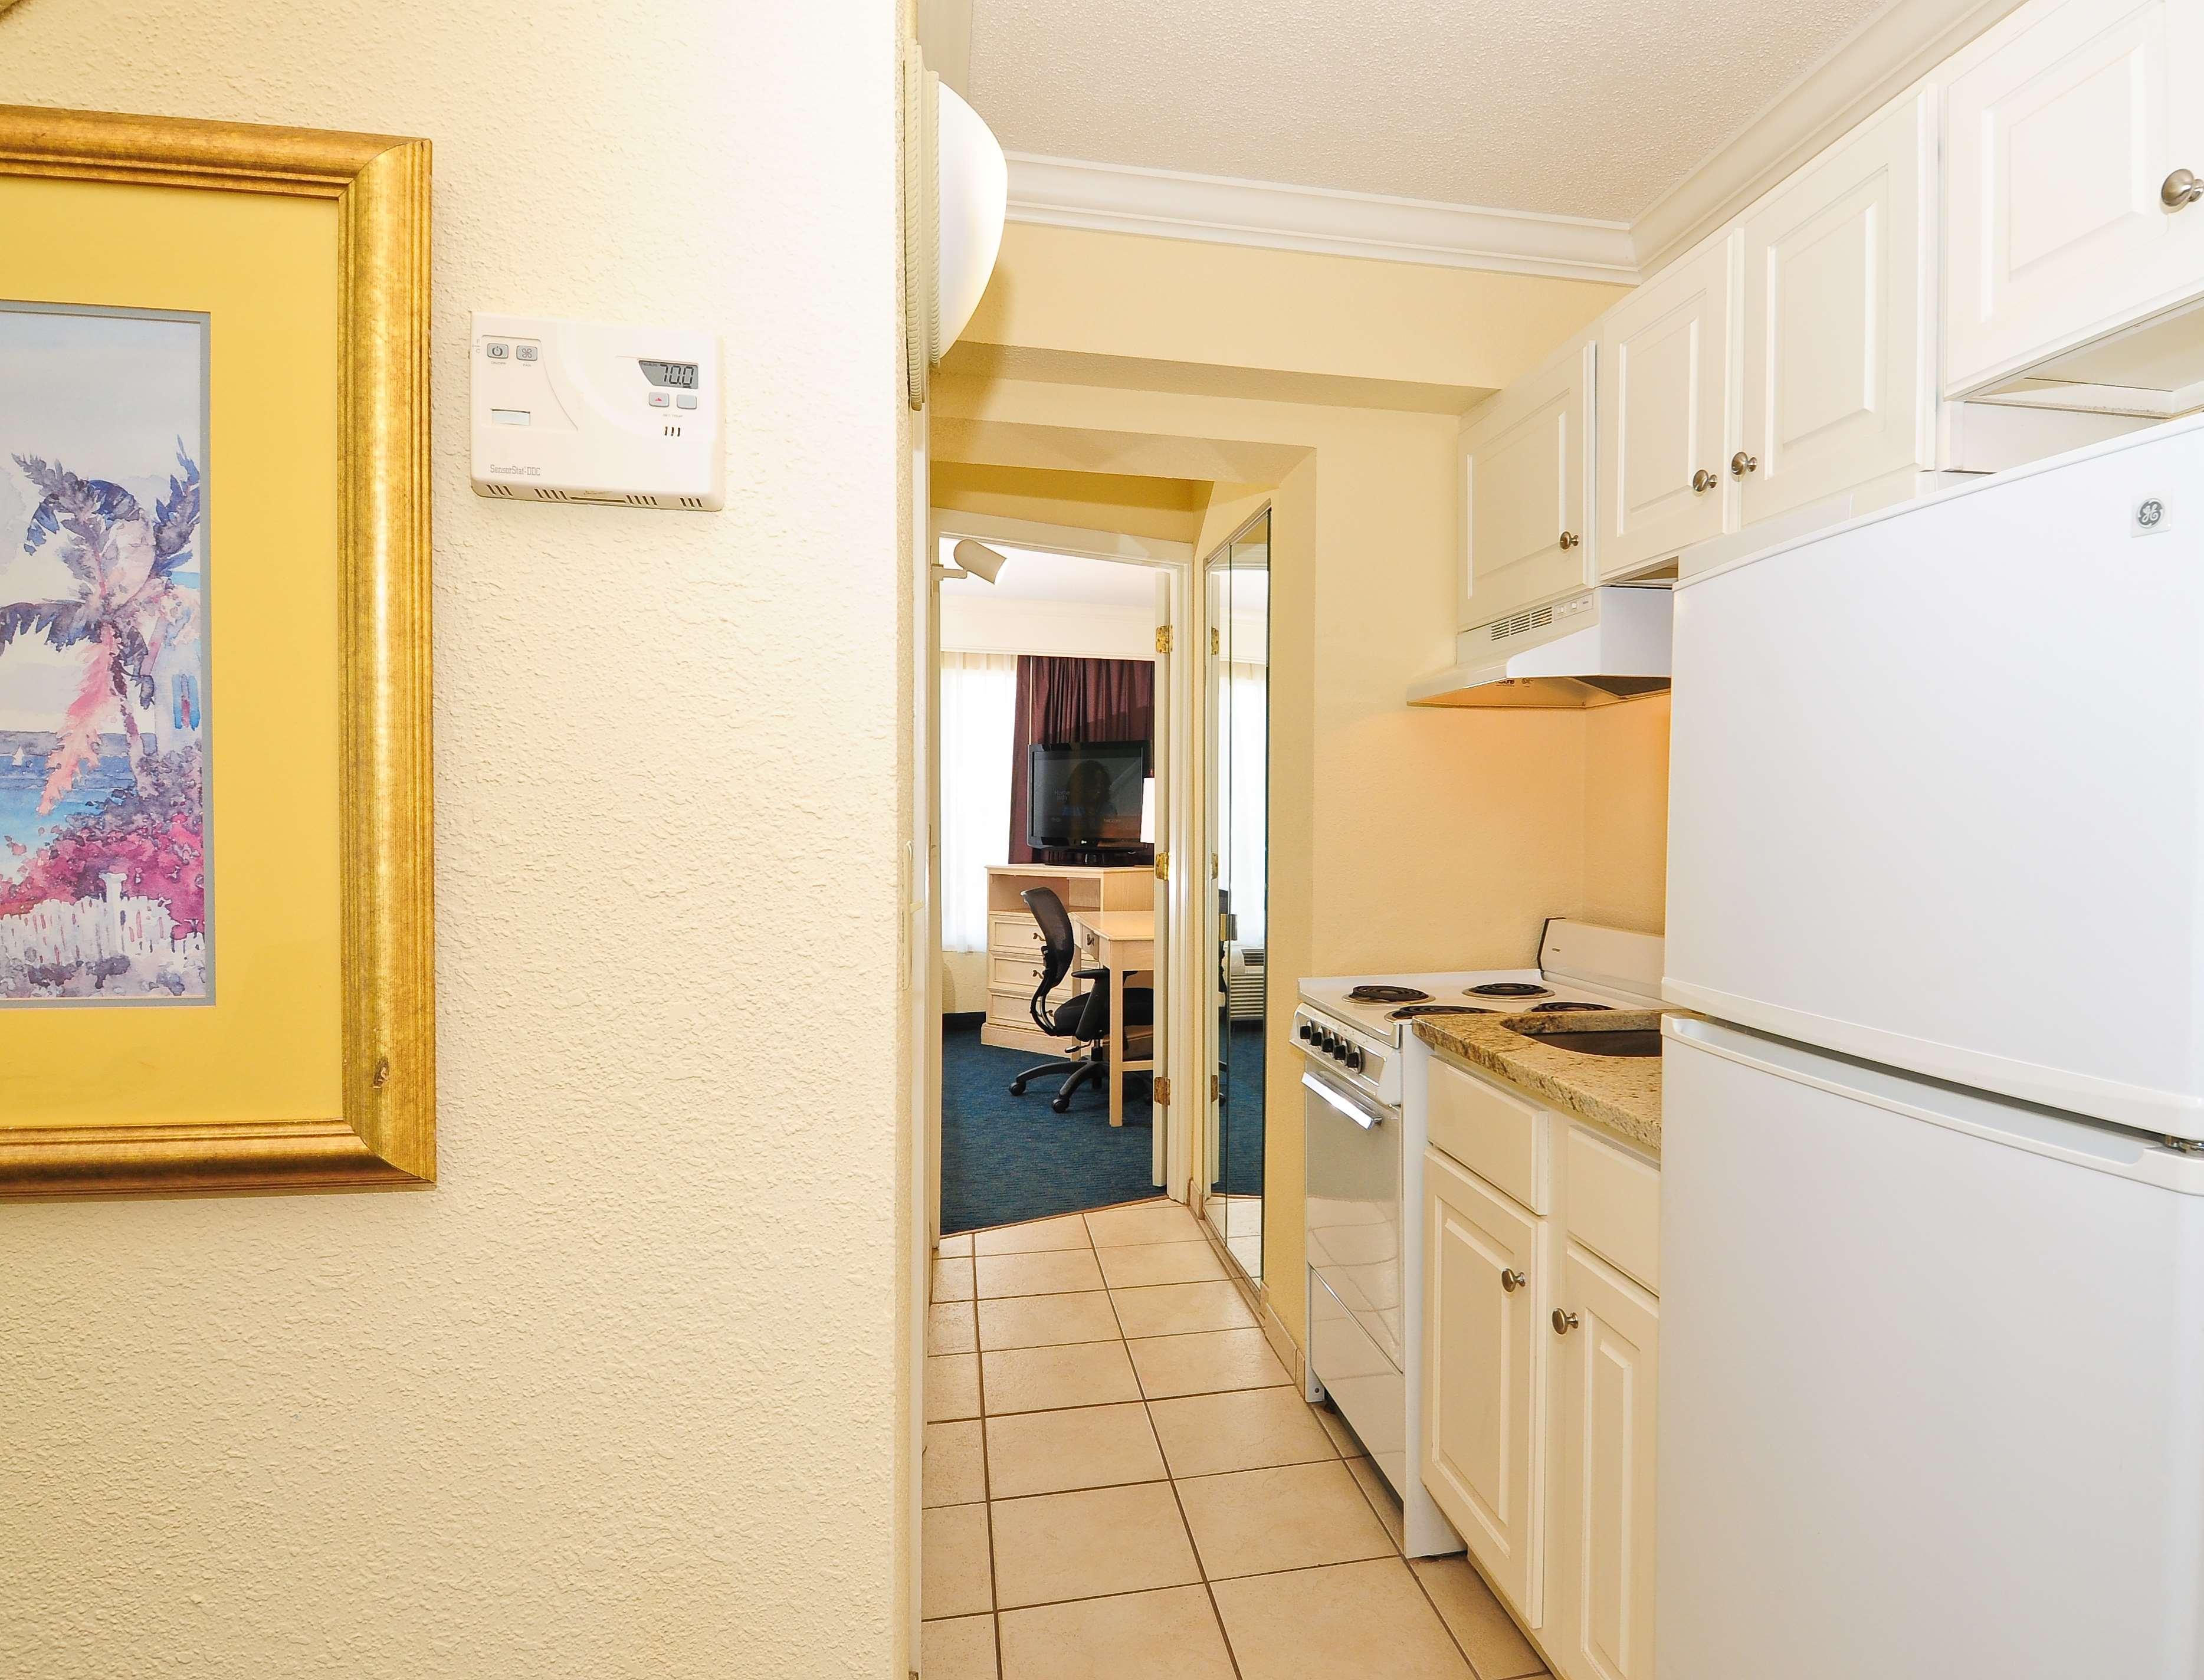 Best Western Plus Grand Strand Inn & Suites image 14